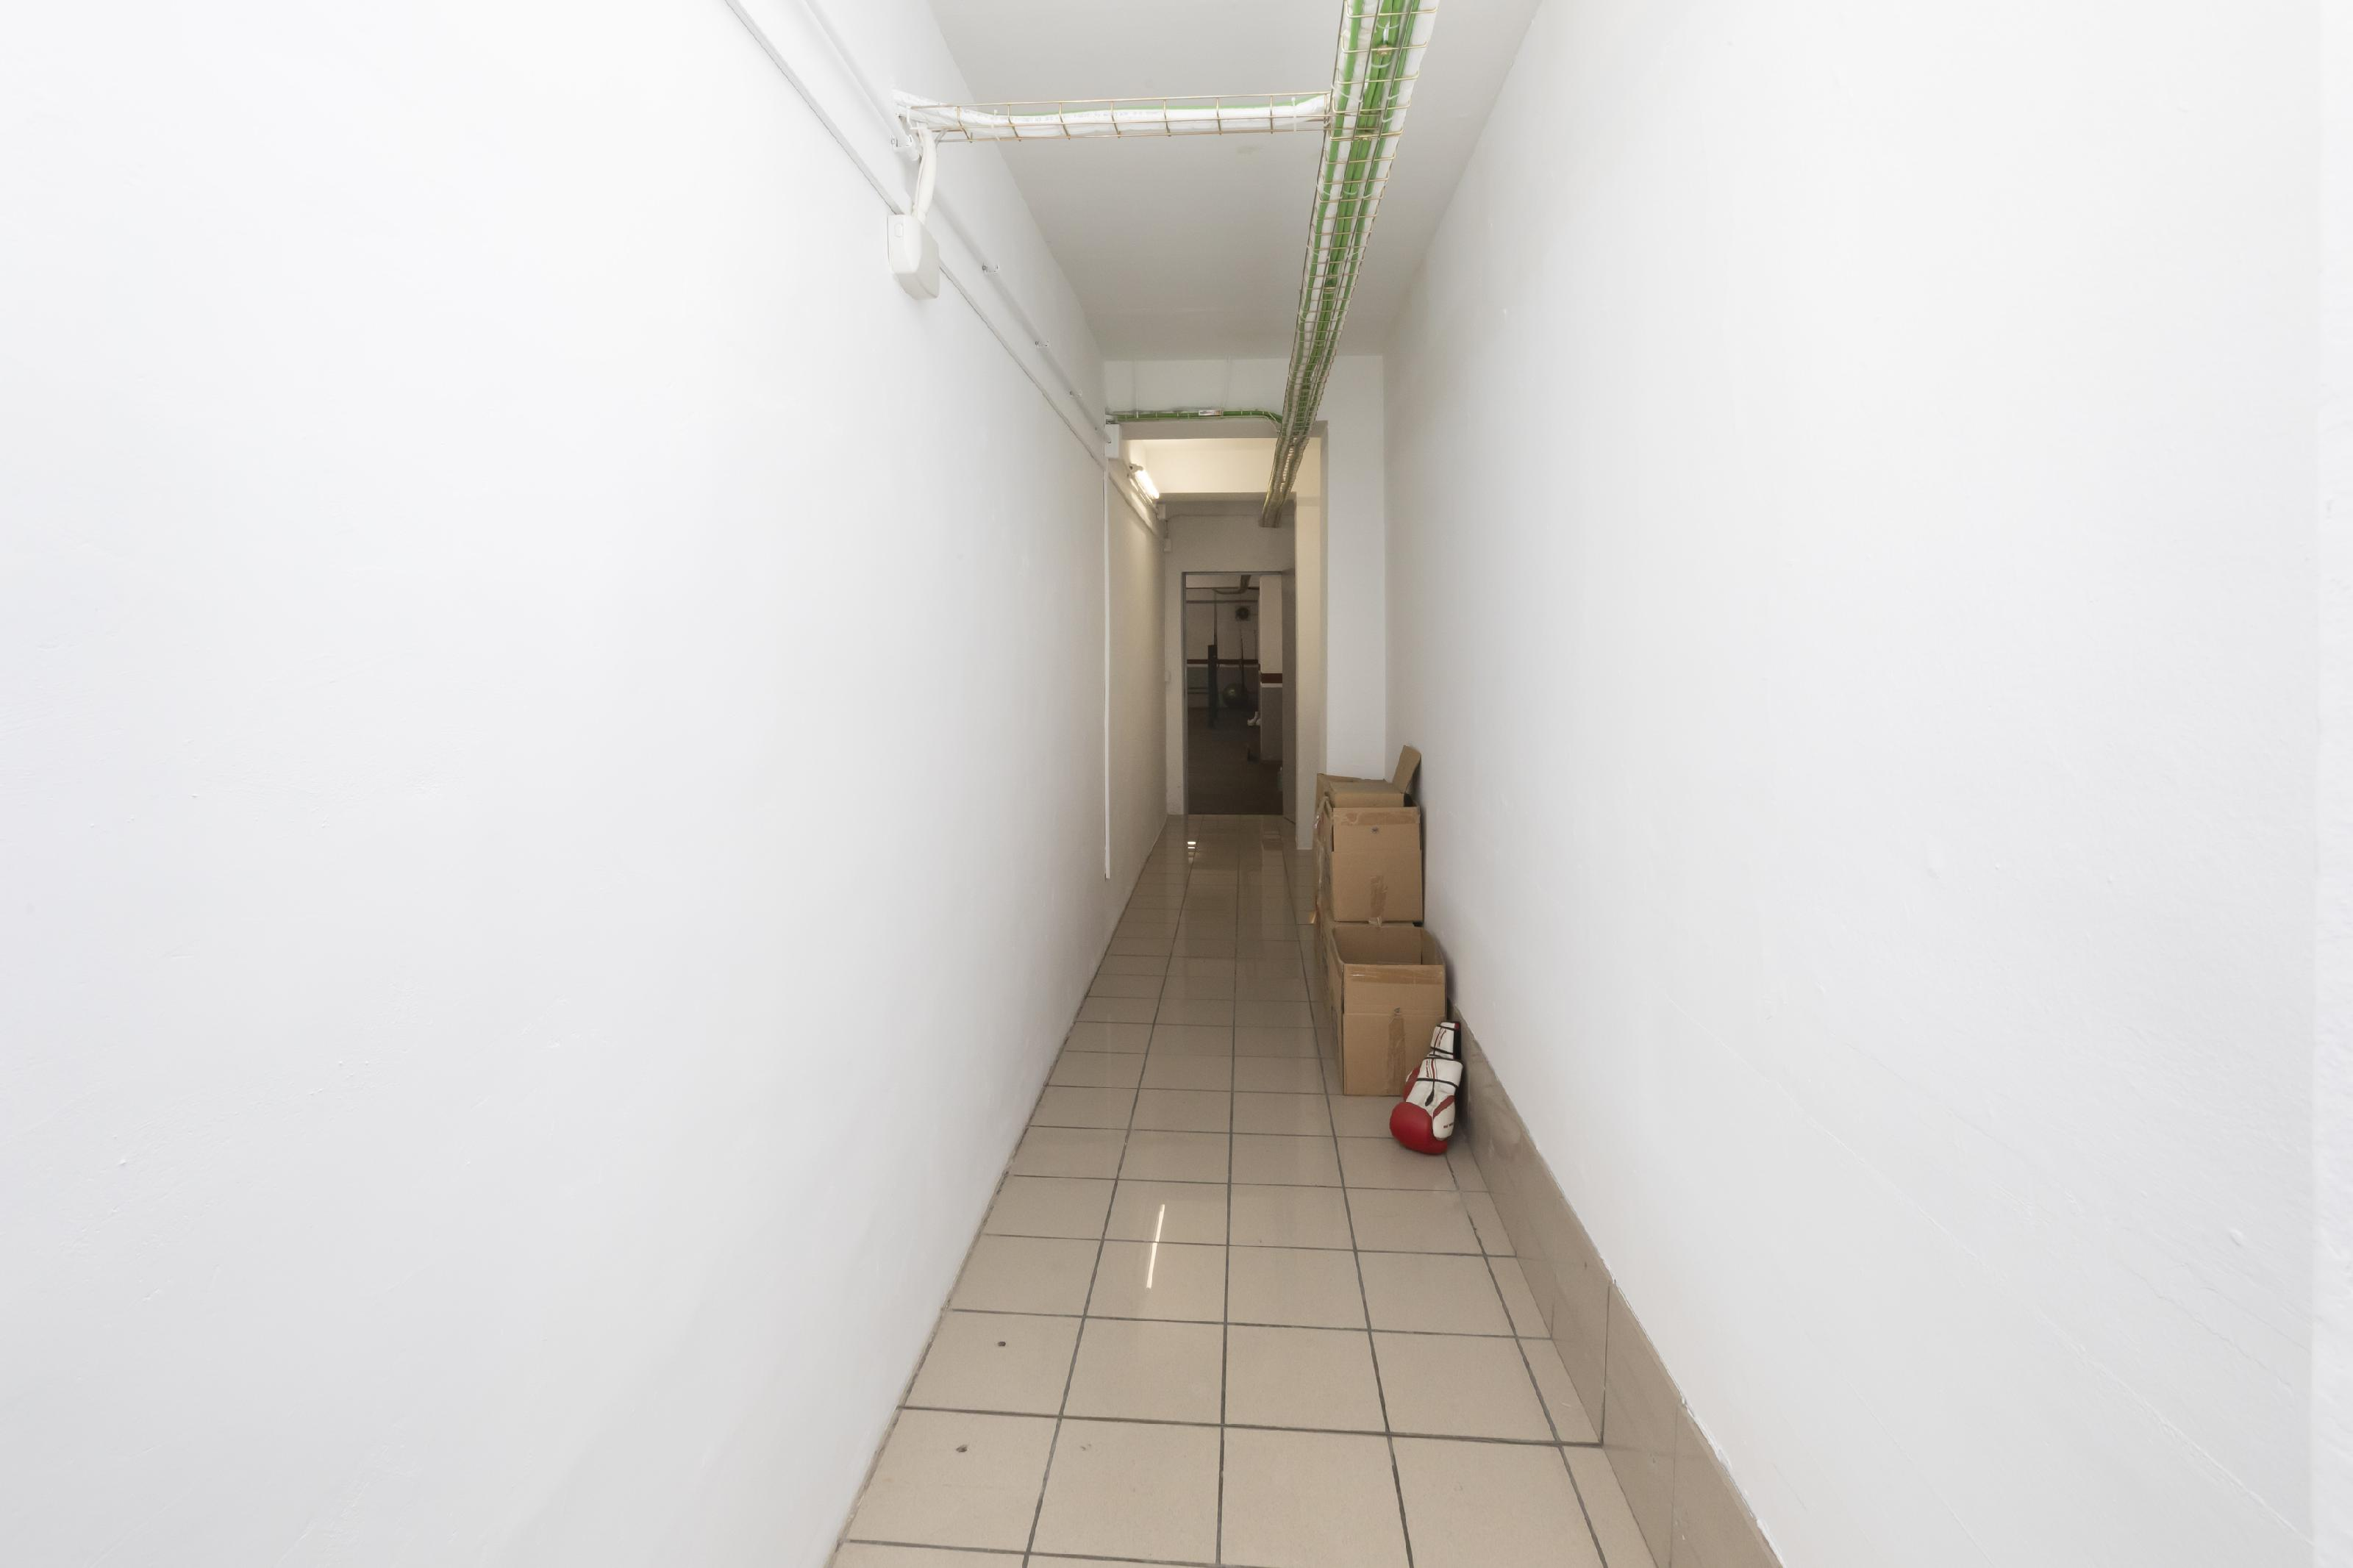 249493 Commercial premises for sale in Sarrià-Sant Gervasi, Sant Gervasi-Galvany 12